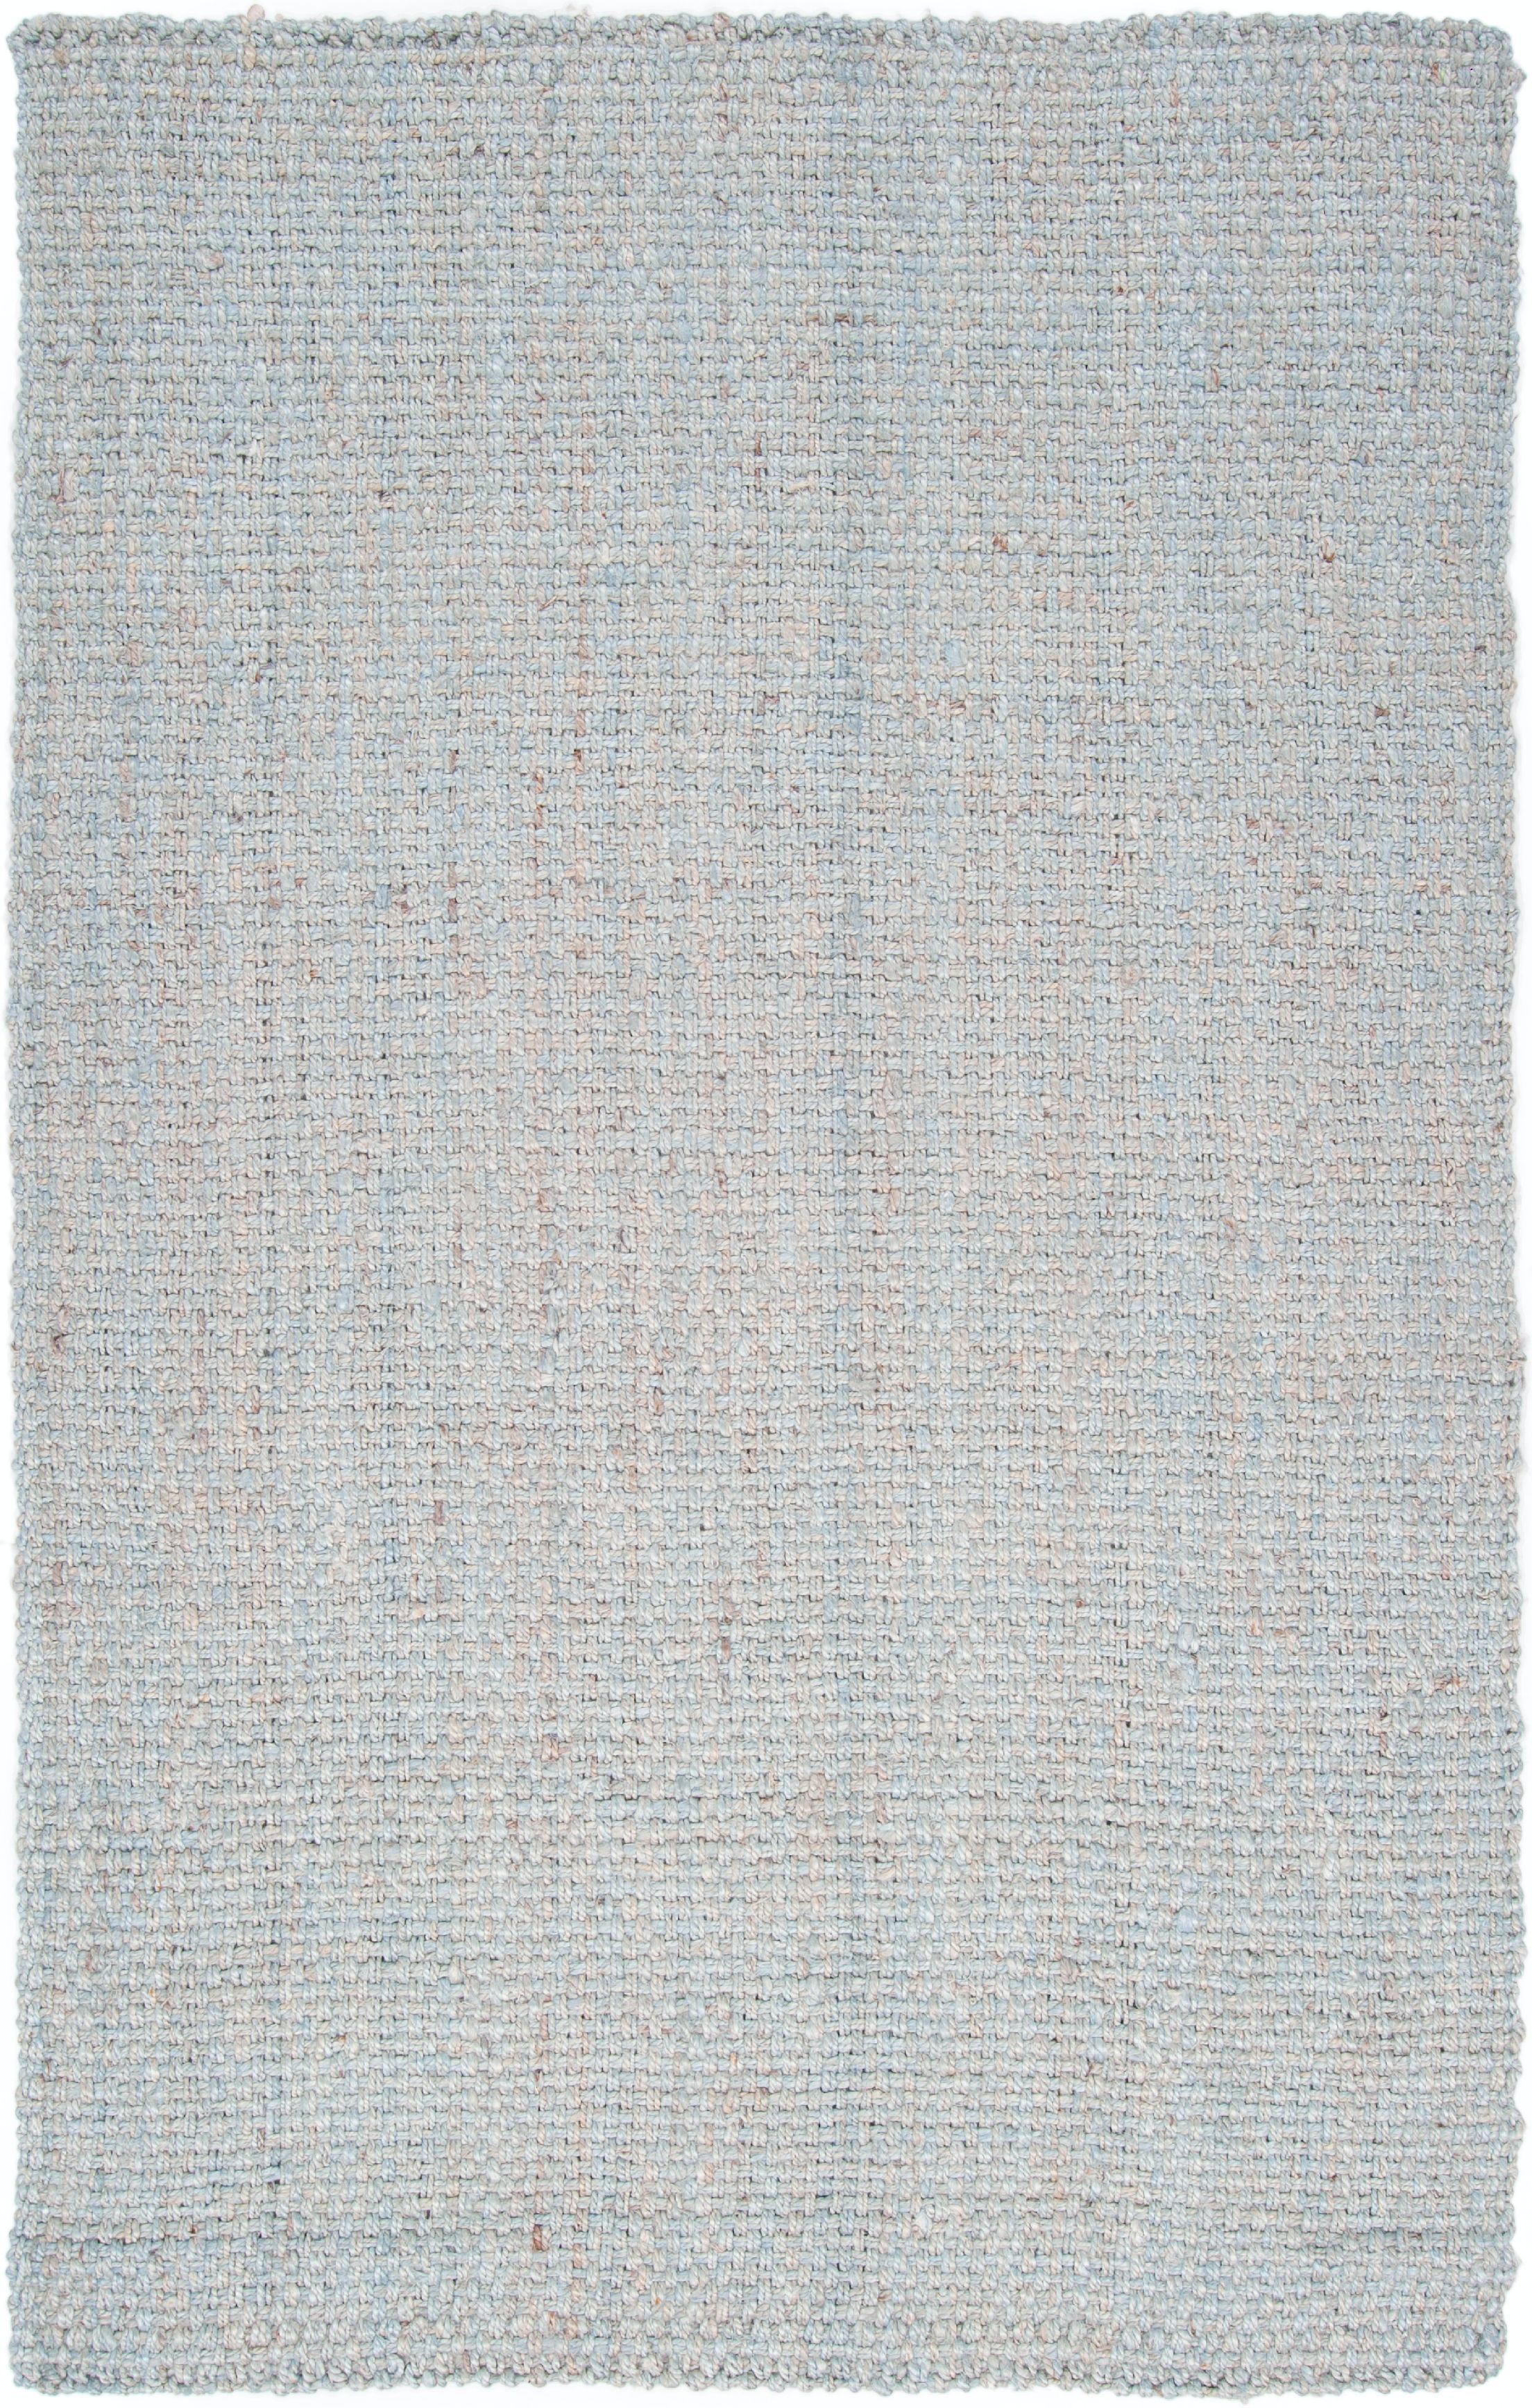 Surya Floor Coverings Jute Woven Area Rug Js220 Upper